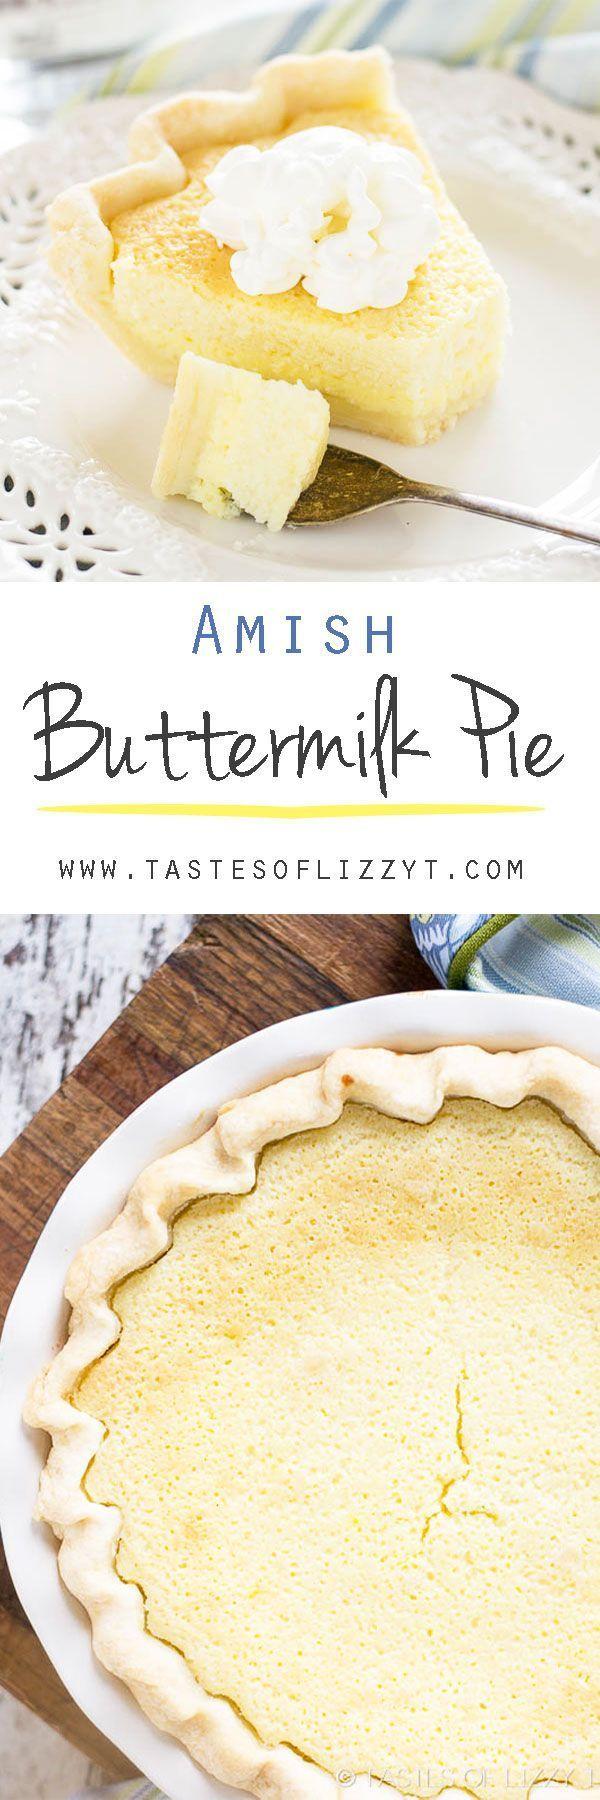 Amish Buttermilk Pie Tastes Of Lizzy T S Amish Recipes Unique Pies Buttermilk Pie